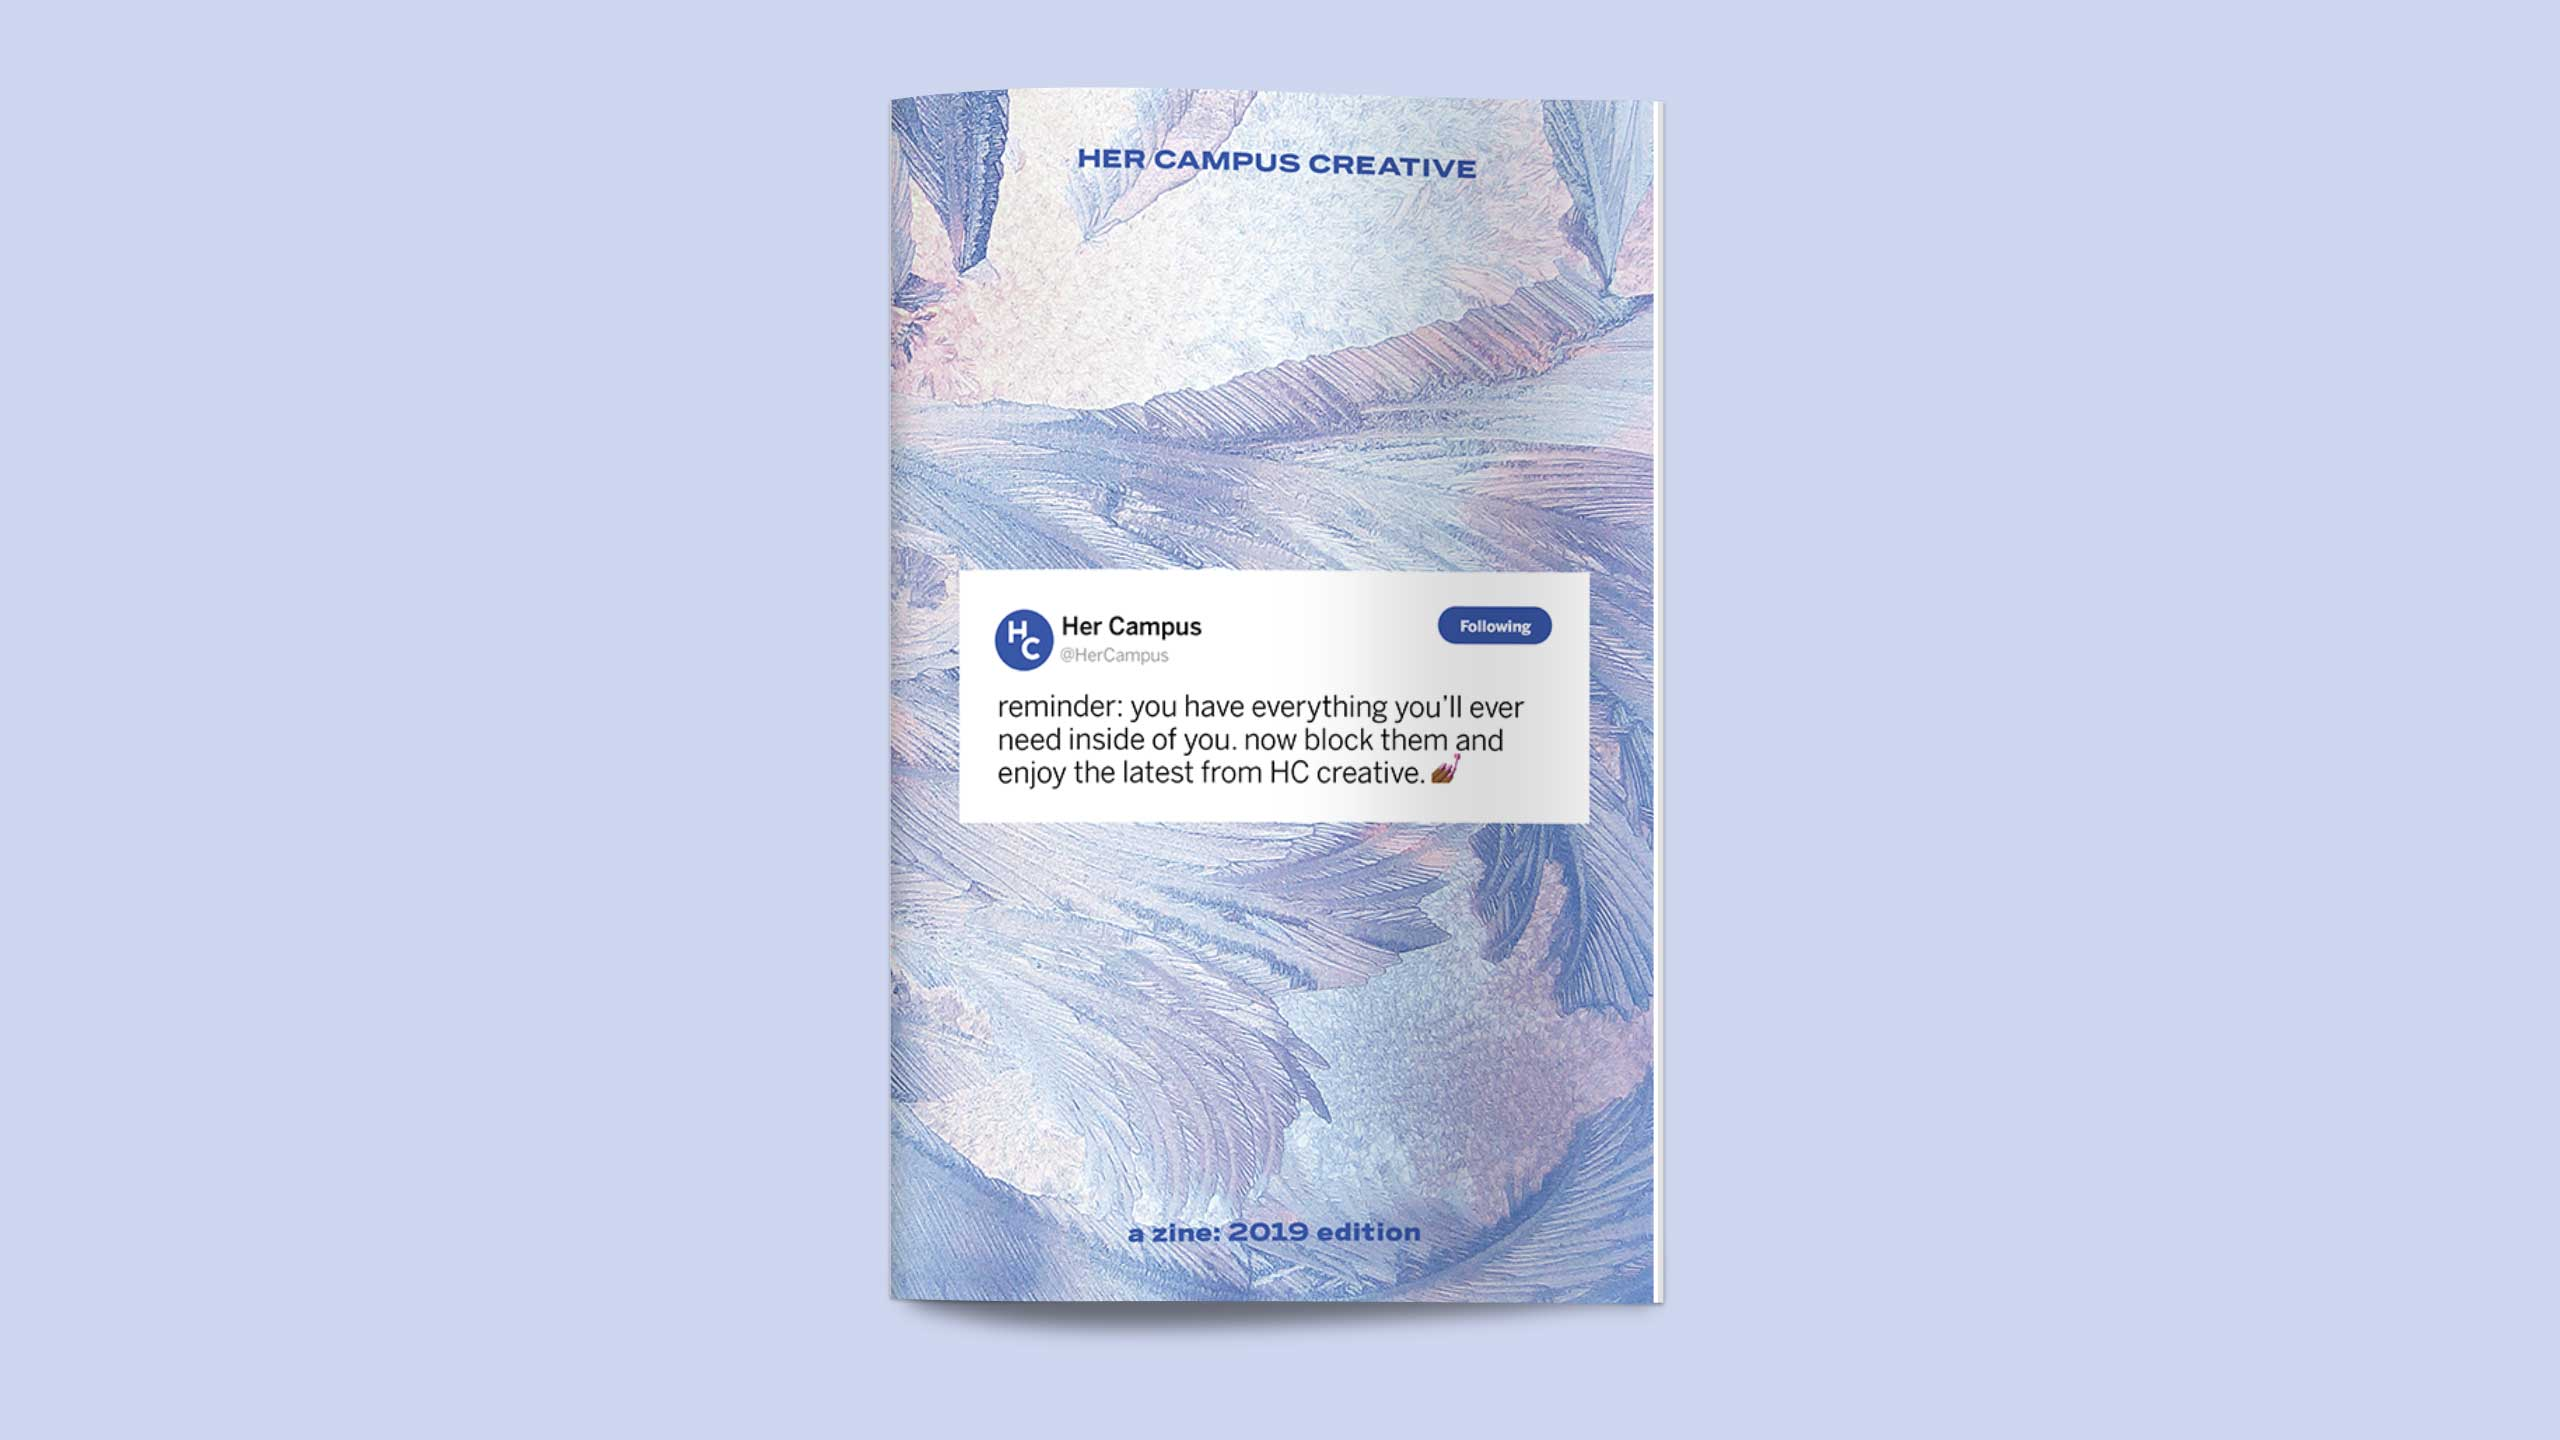 Her Campus Creative Zine Cover